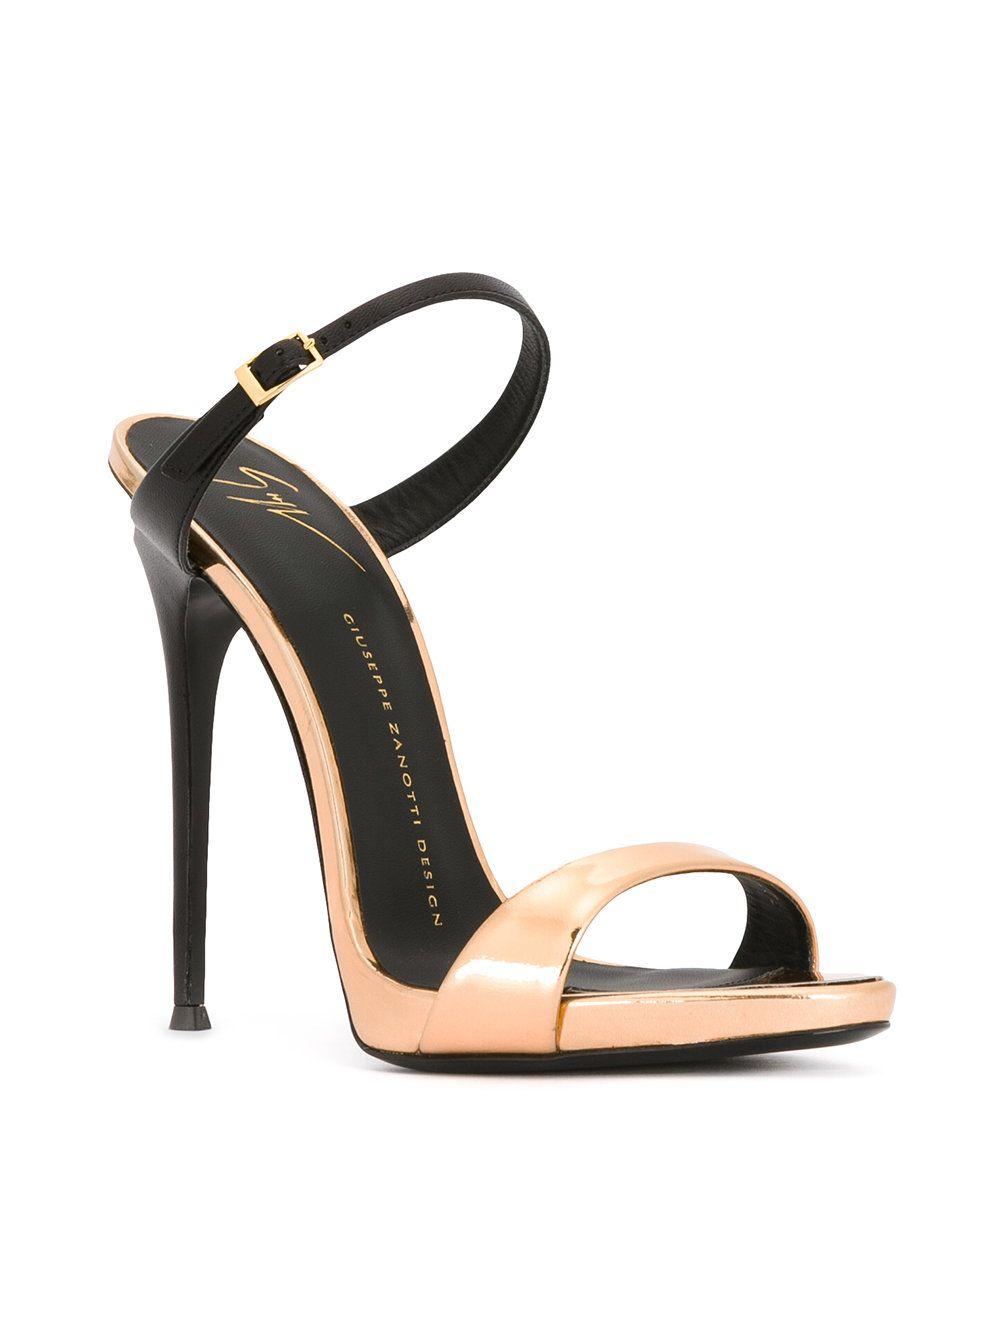 Giuseppe Zanotti Design Tania Sandals Farfetch Giuseppe Zanotti Heels Fashion Heels Heels